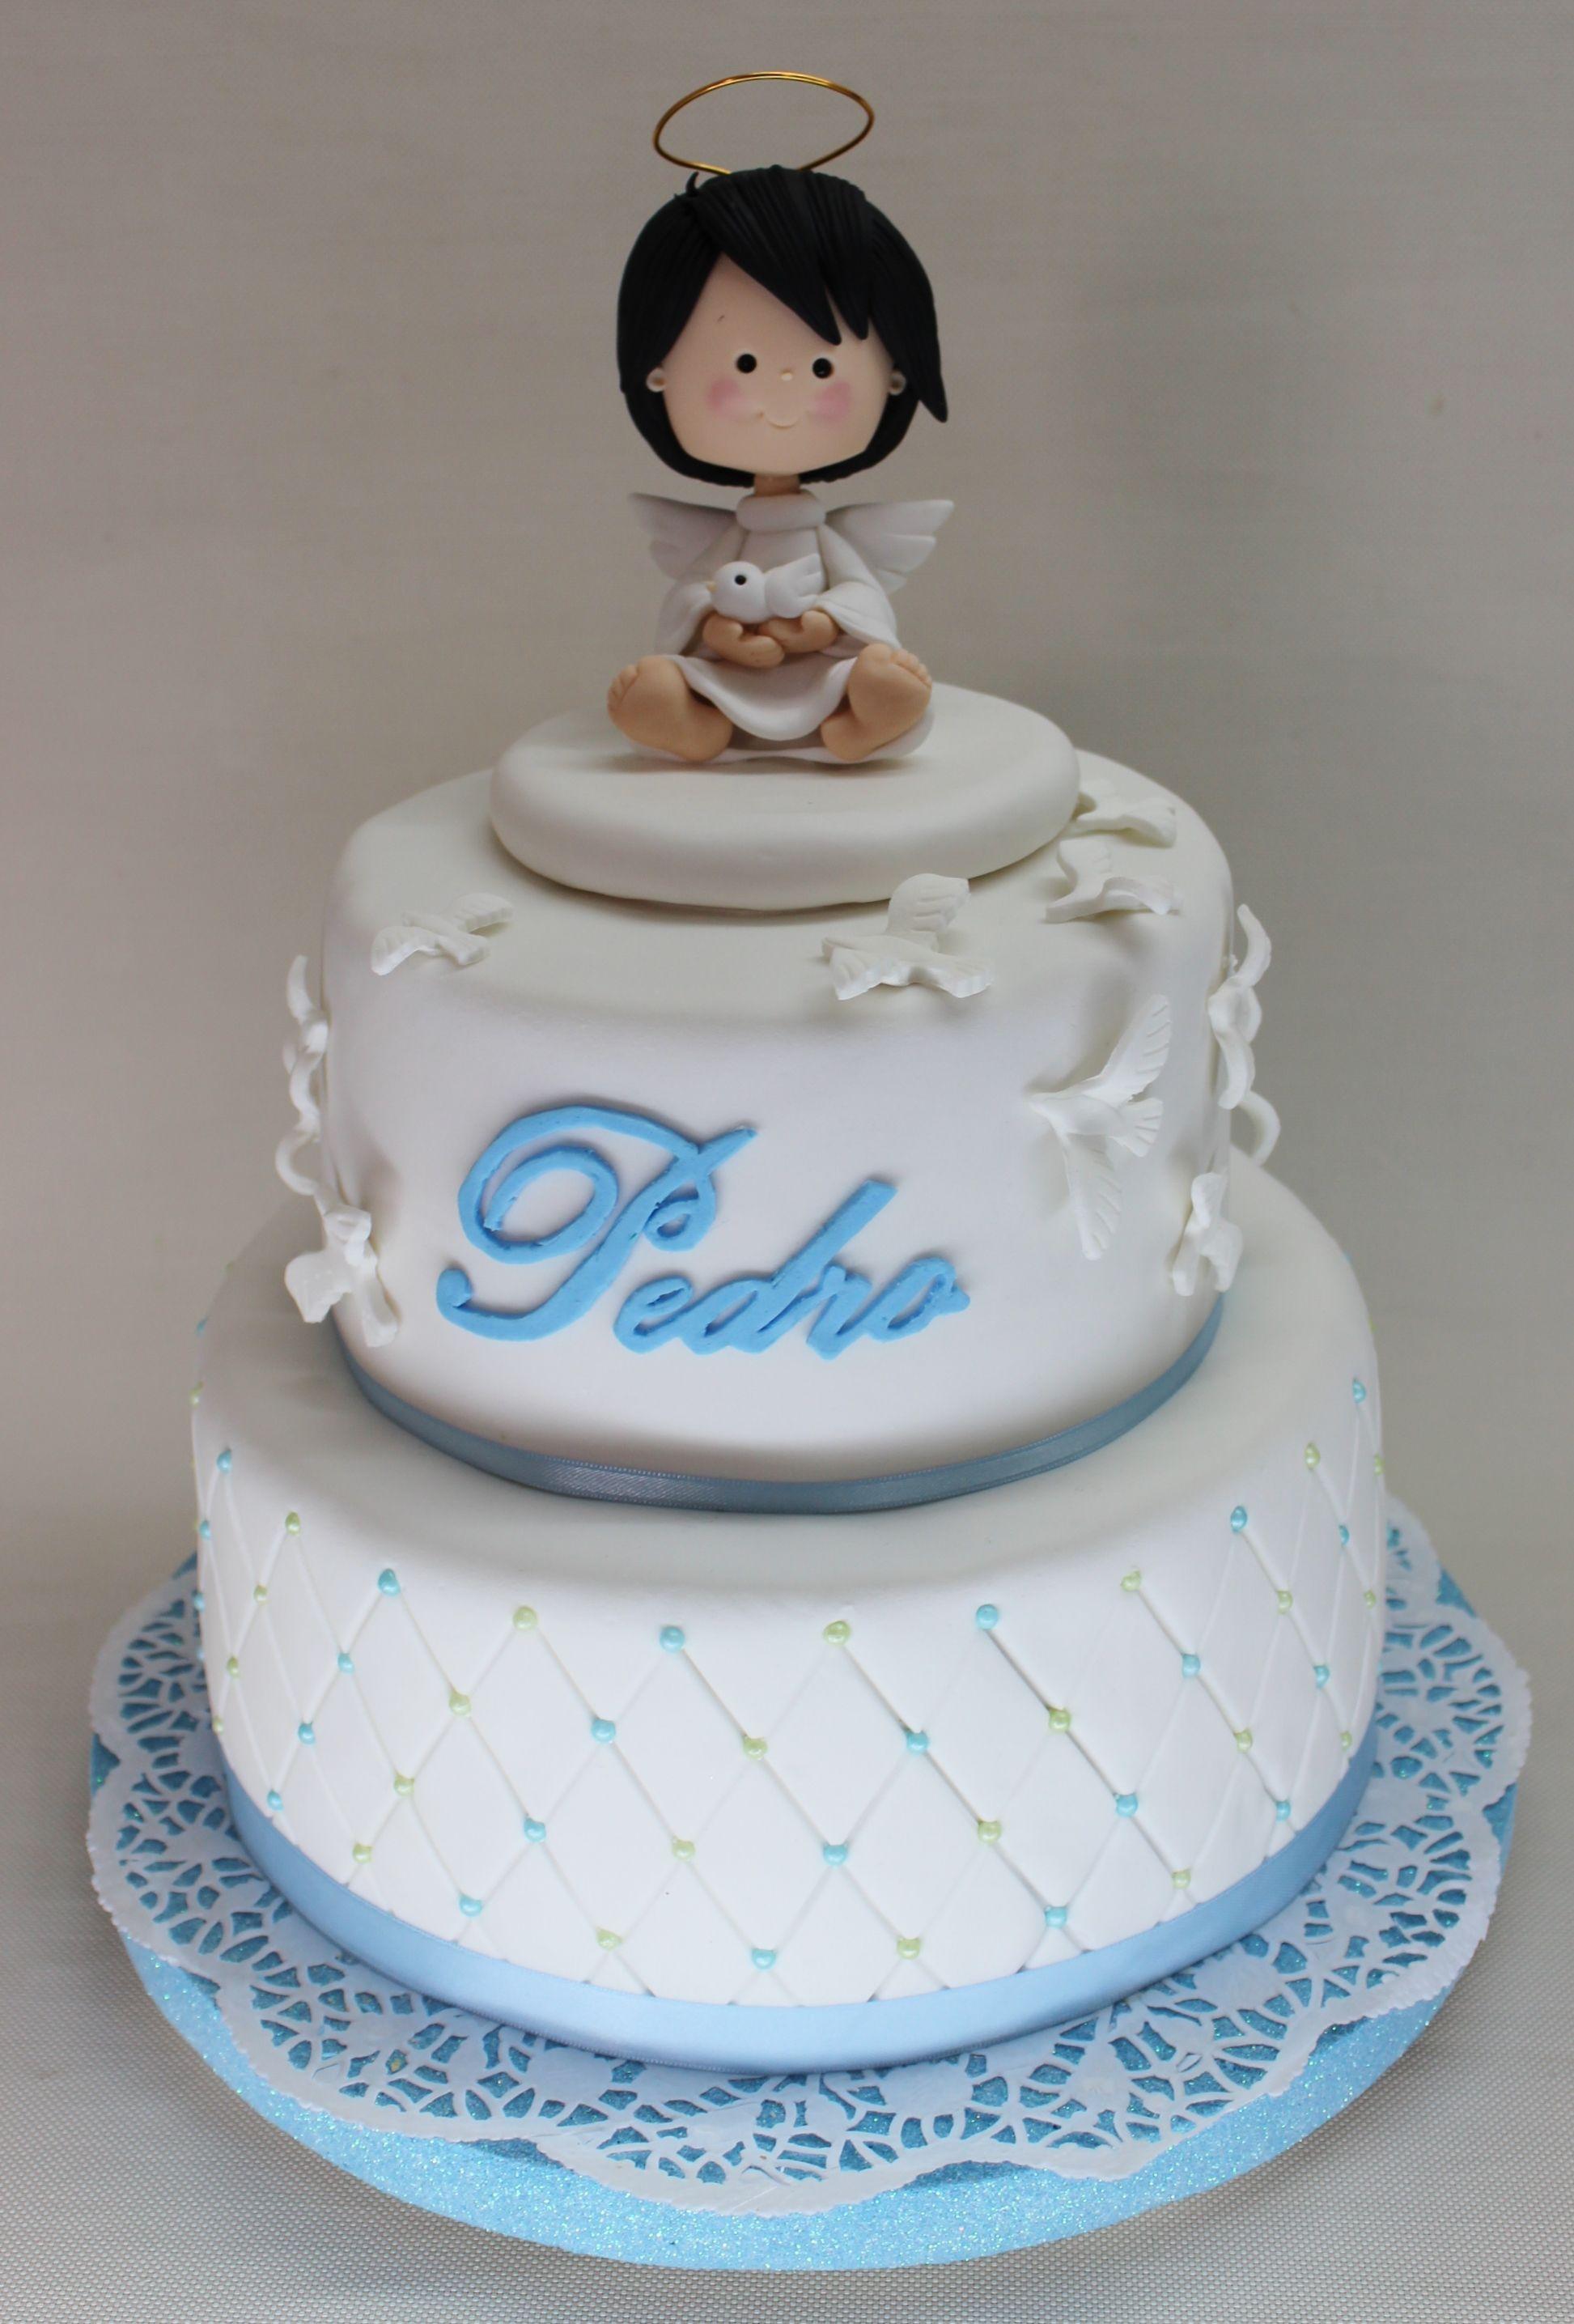 Baptism Cake by Violeta Glace | Bautismo, Torta bautizo, Tortas de ...